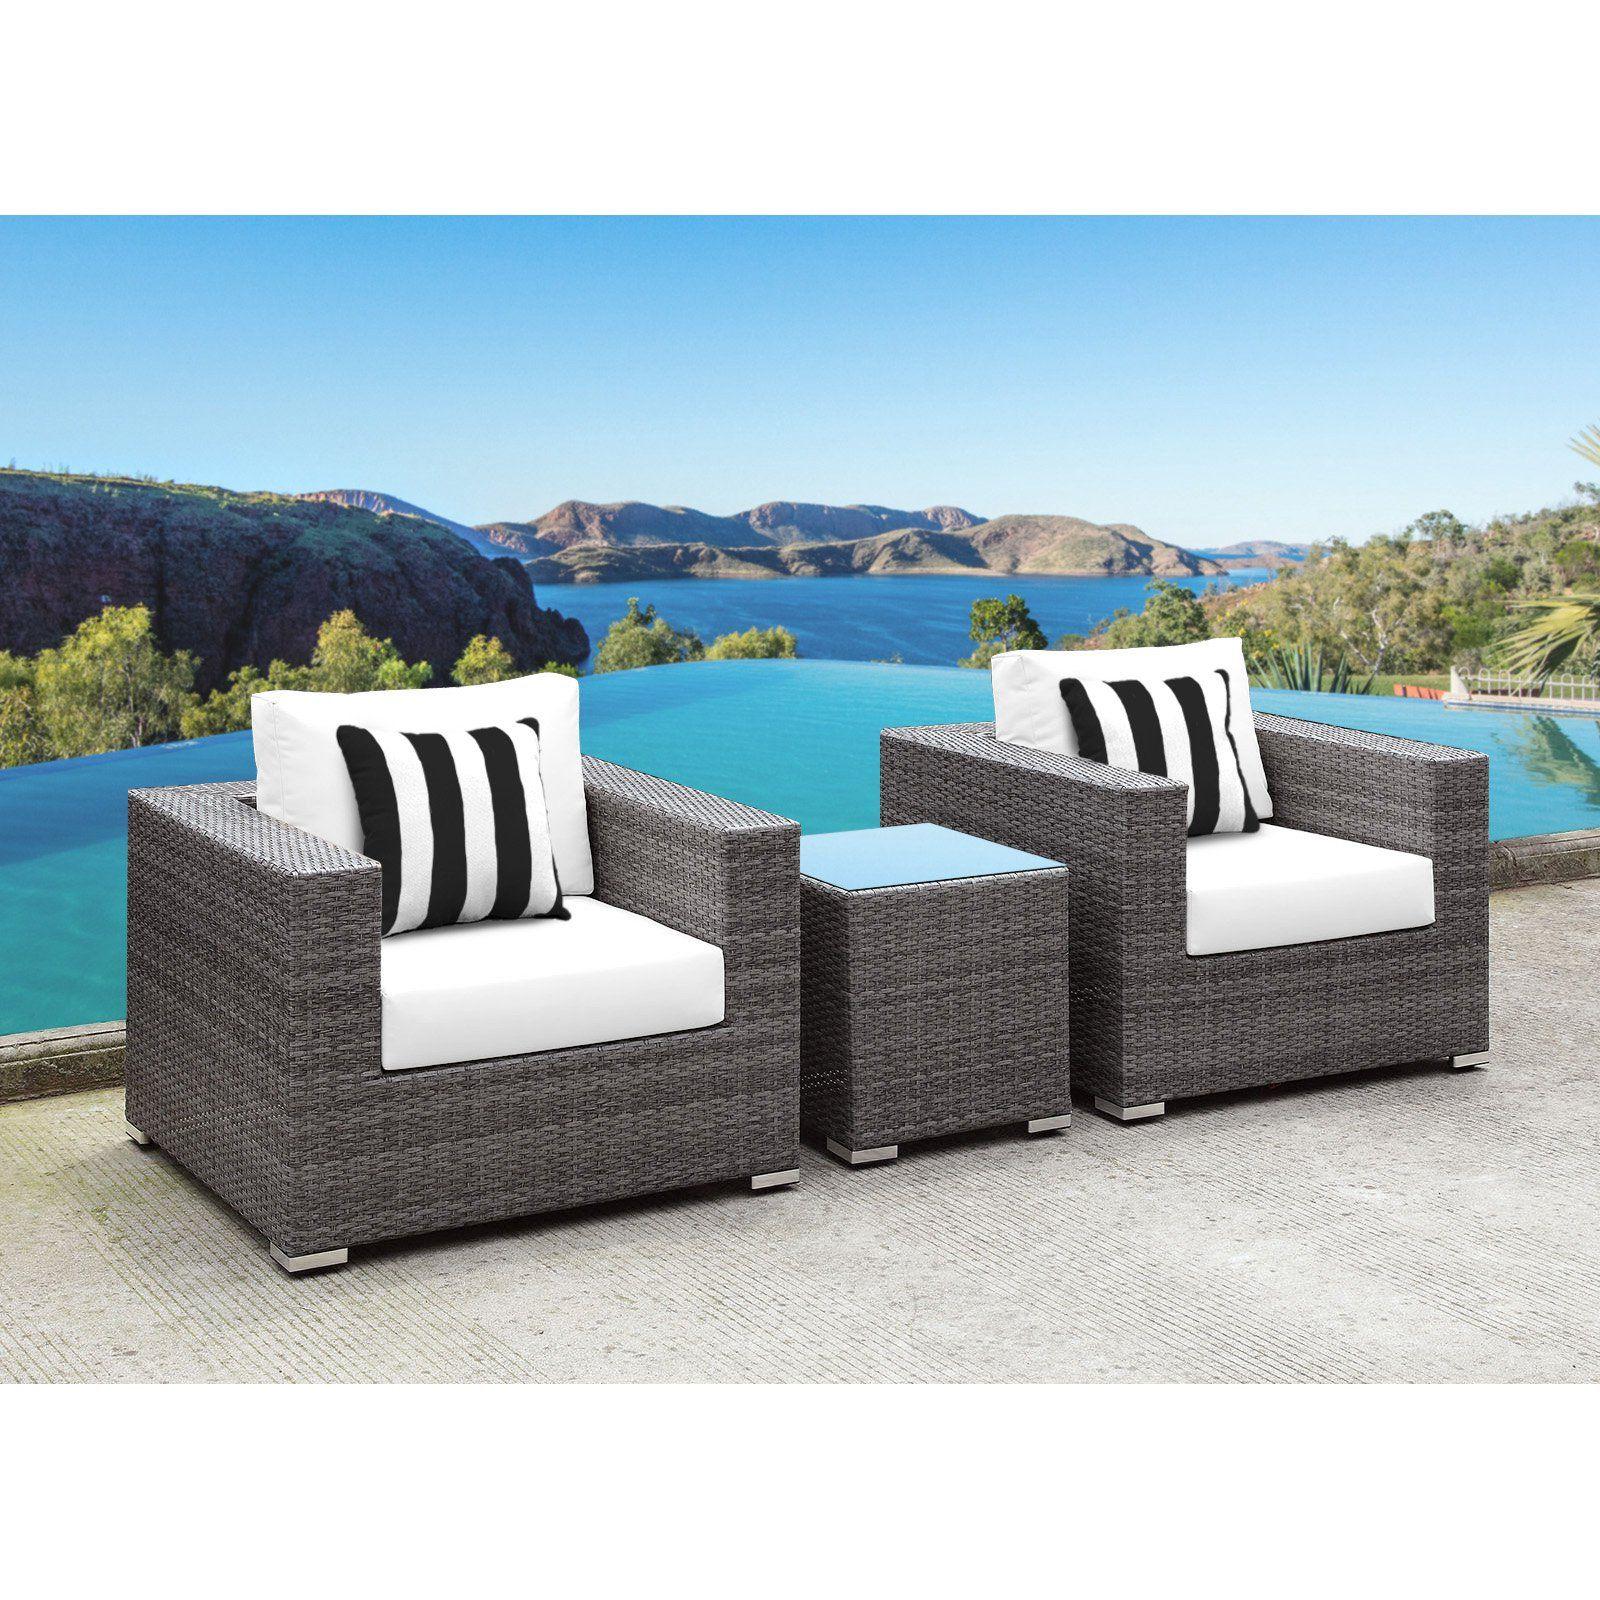 Solis lusso deep seated wicker 3 piece outdoor conversation set white black white